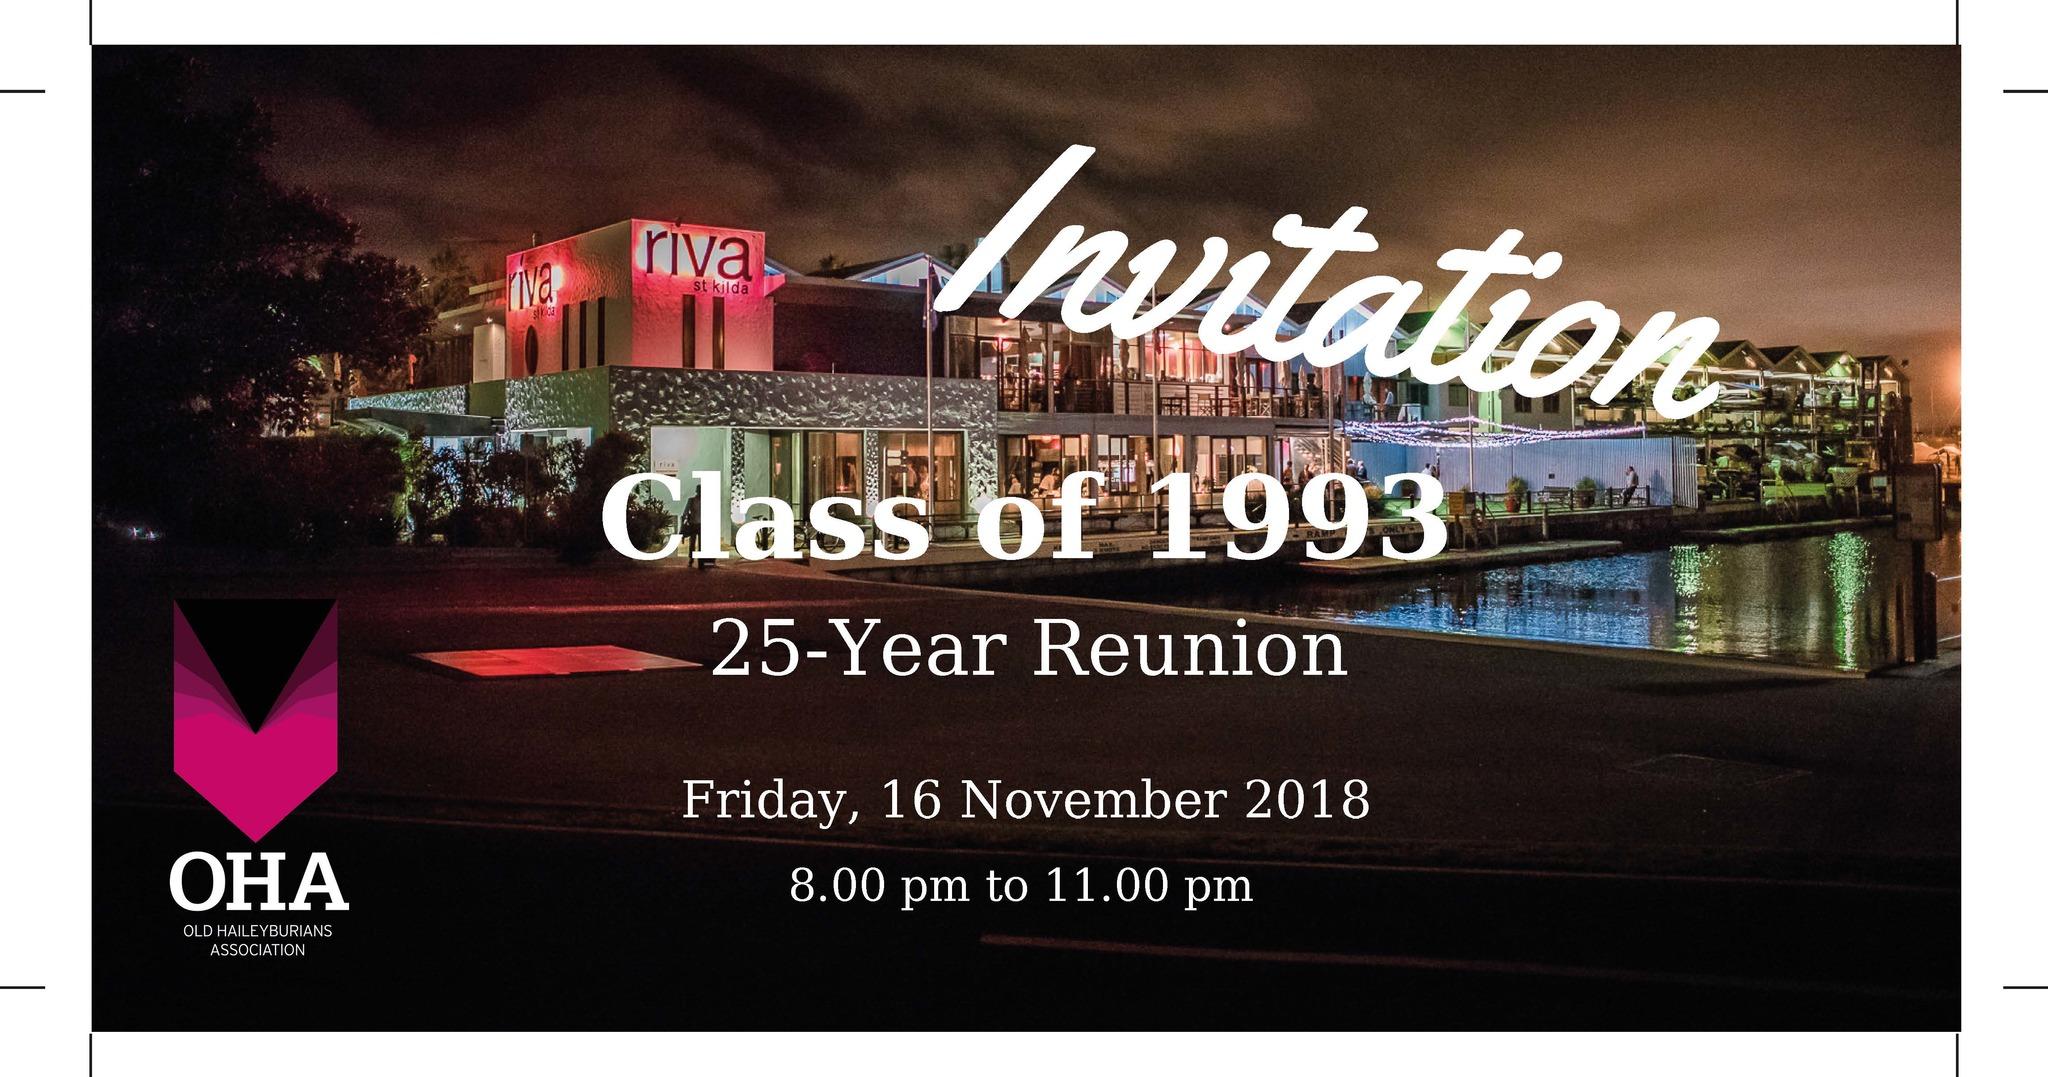 Class of 1993 - 25 Year Reunion